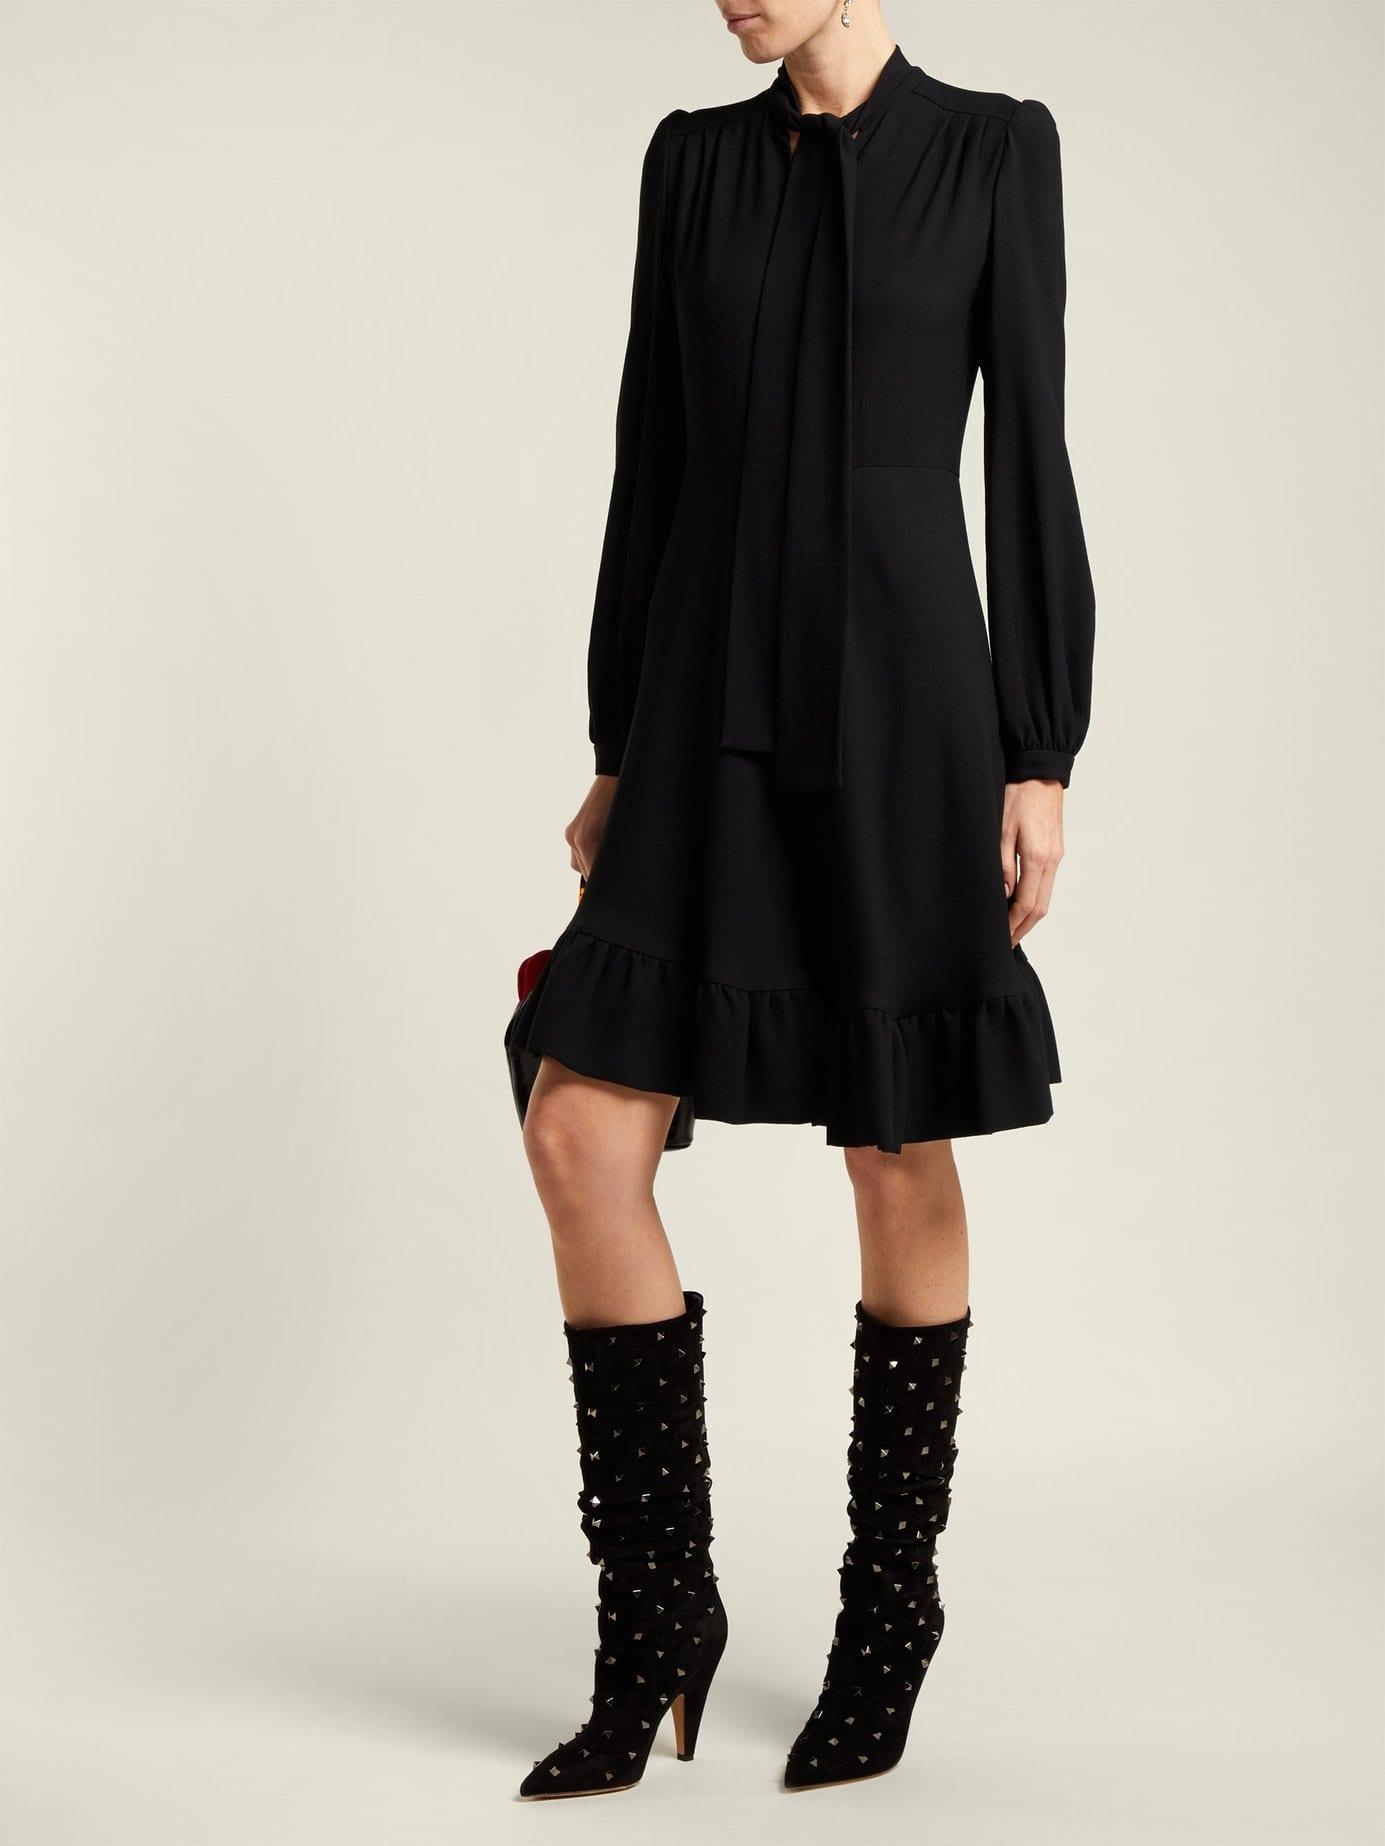 GIAMBATTISTA VALLI Pussy Bow Crepe Black Dress